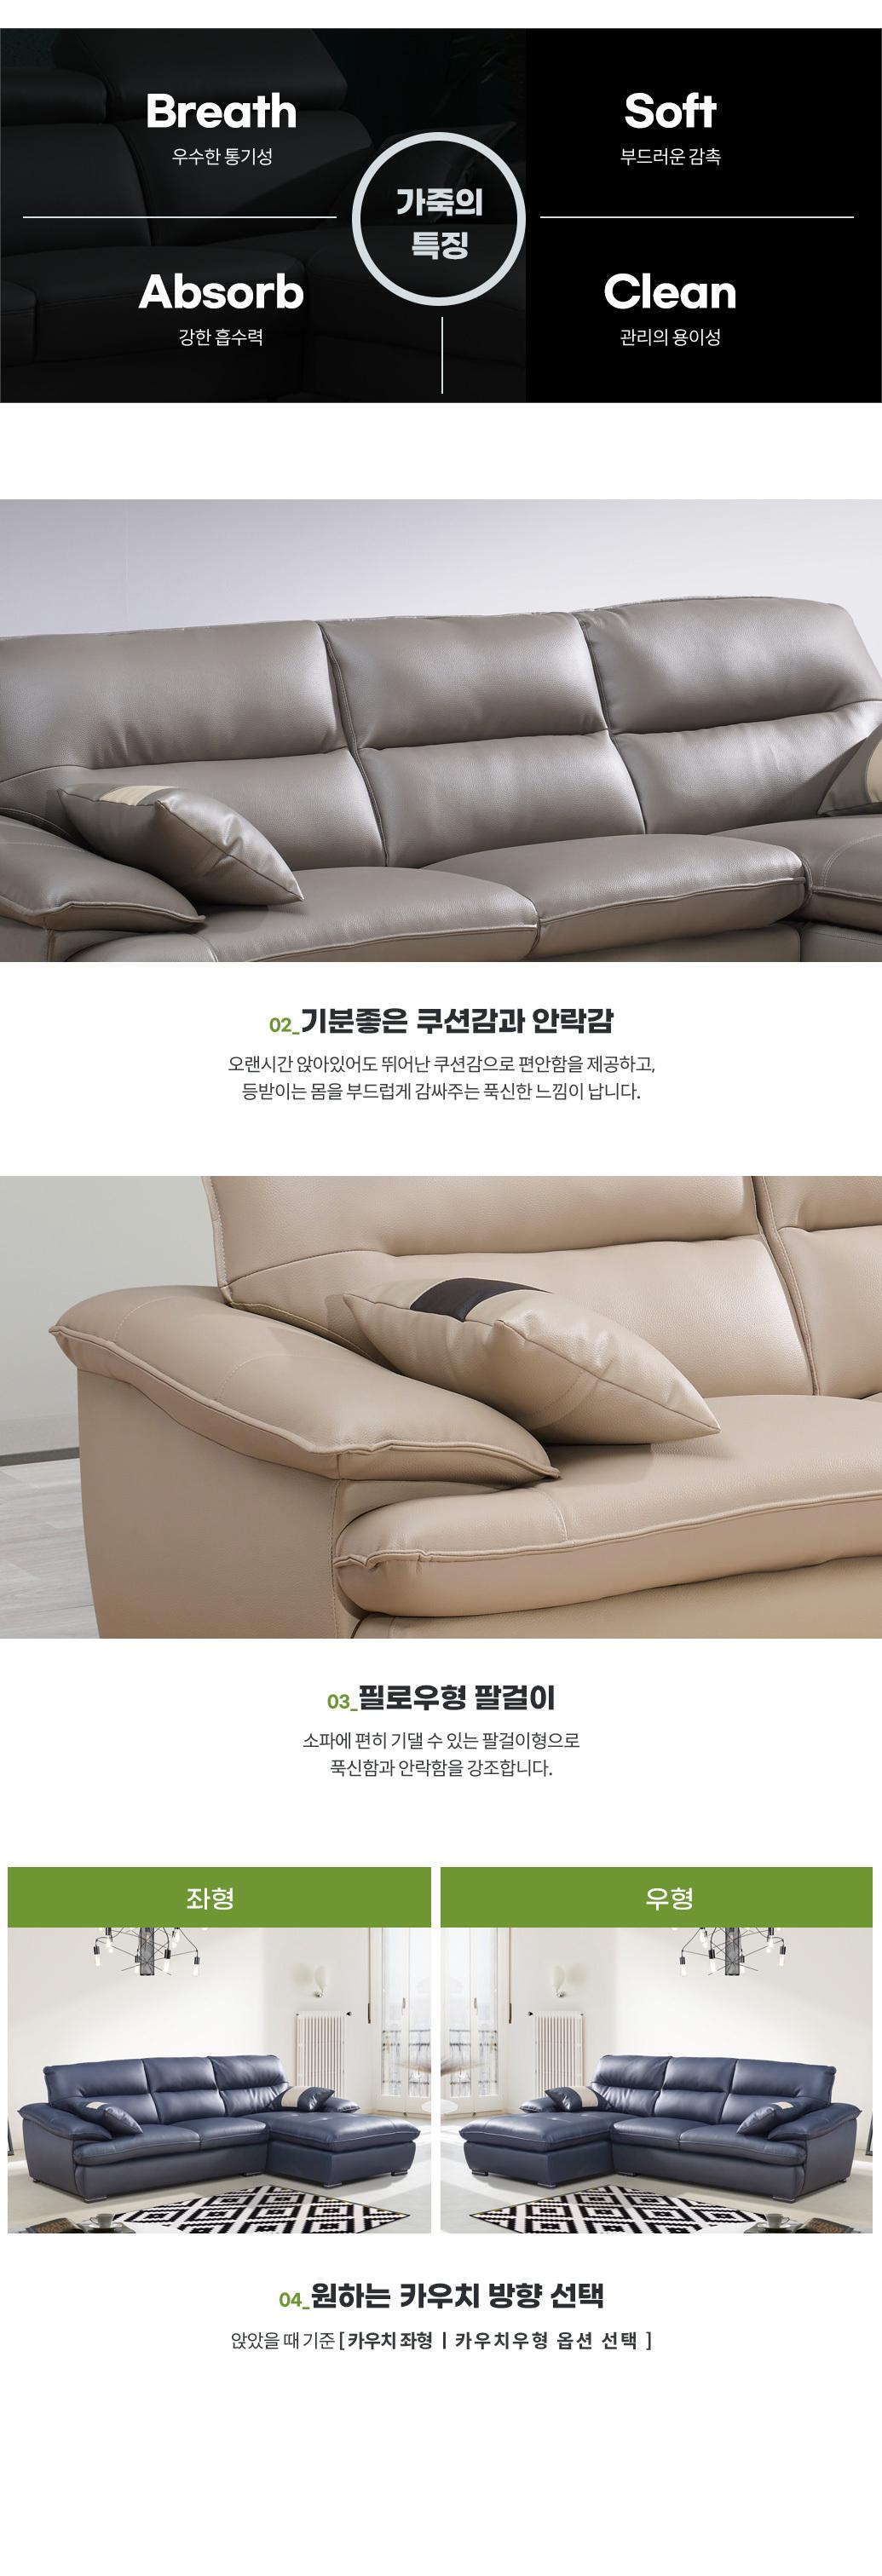 Pebble_couch_03.jpg